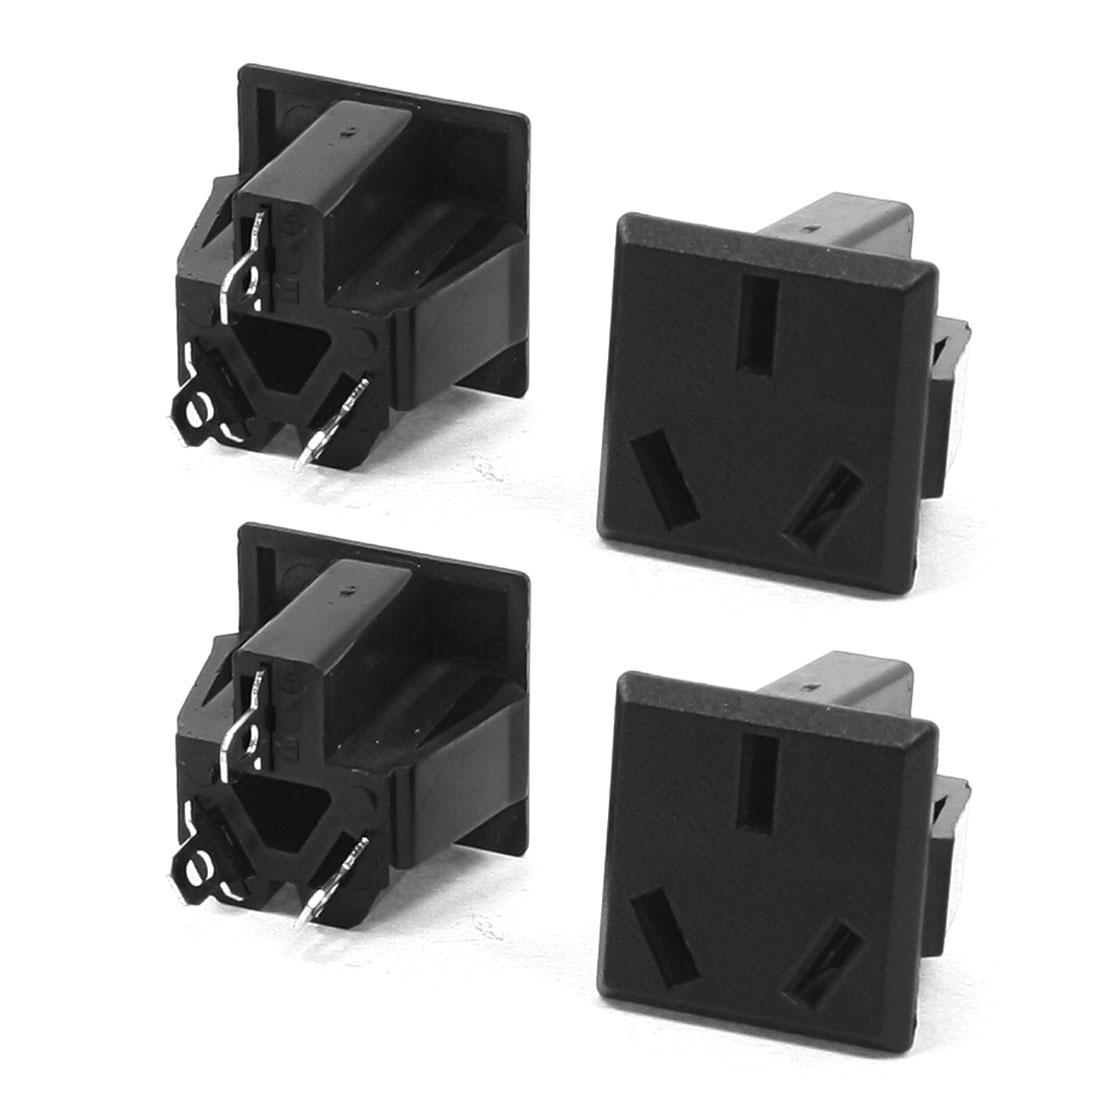 4 Pcs Square Shaped AU 3 Terminals Plug Power Socket Adapter AC 250V 15A